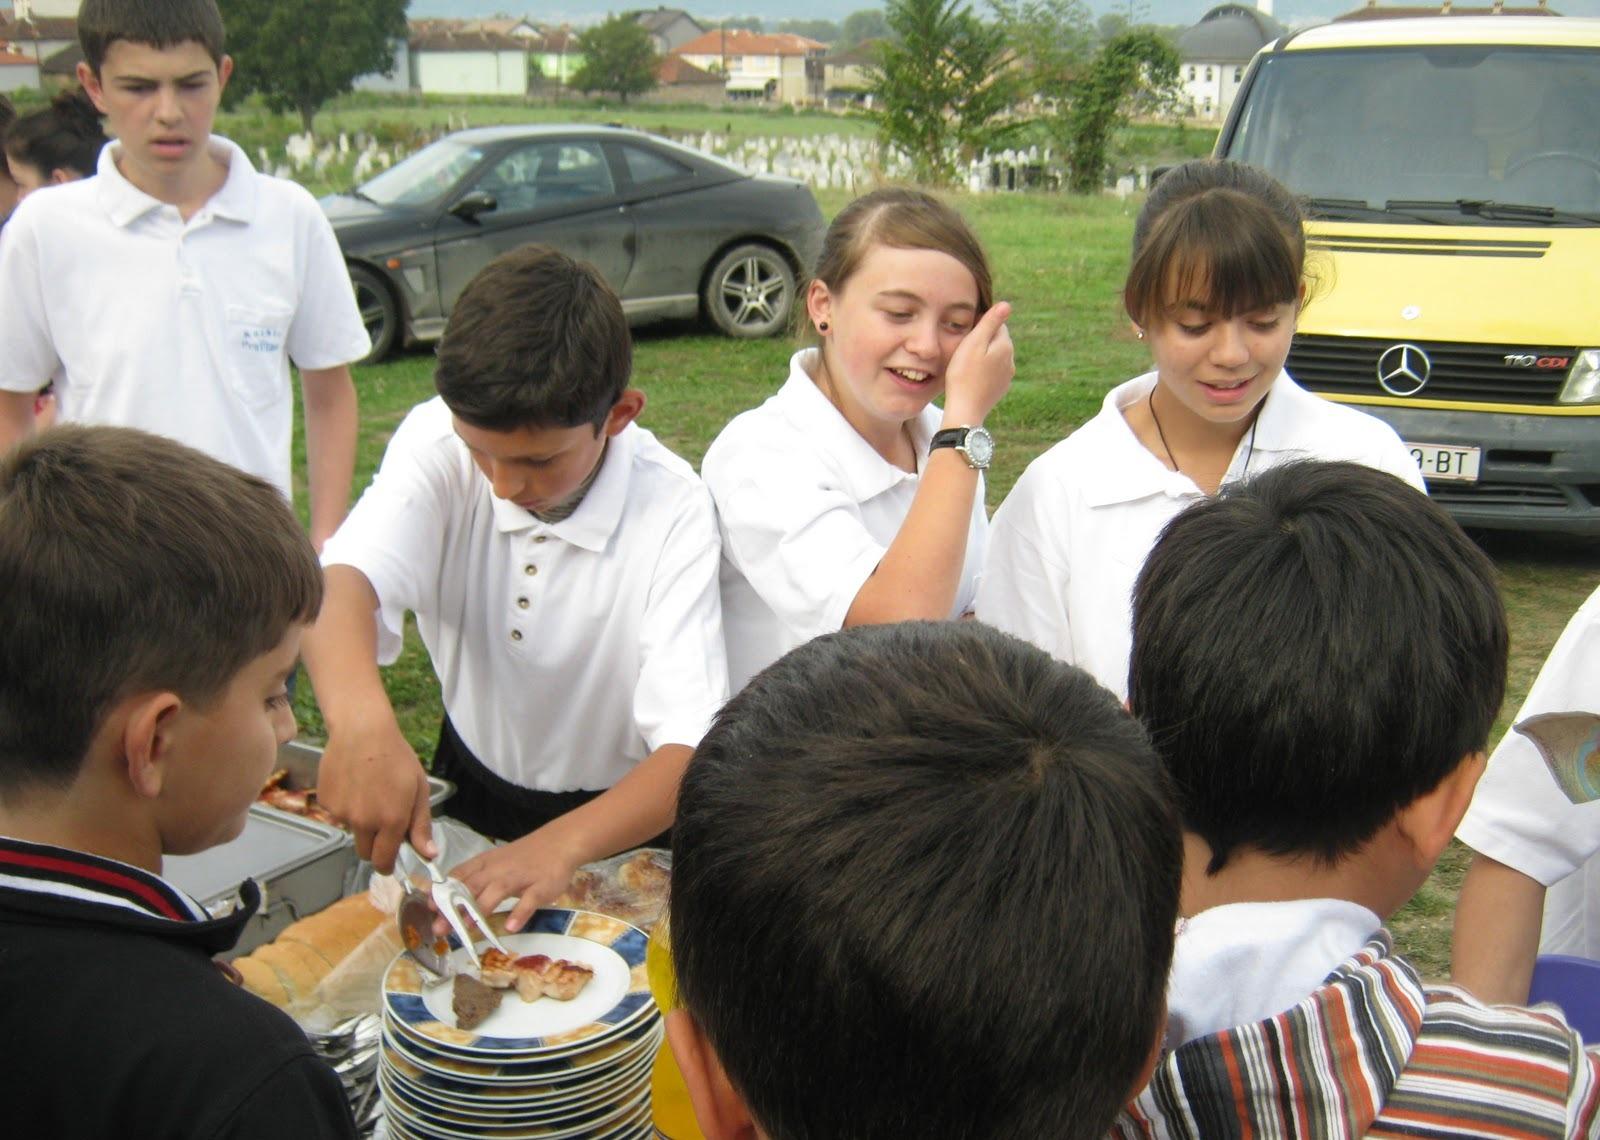 Albanian children face malnutrition